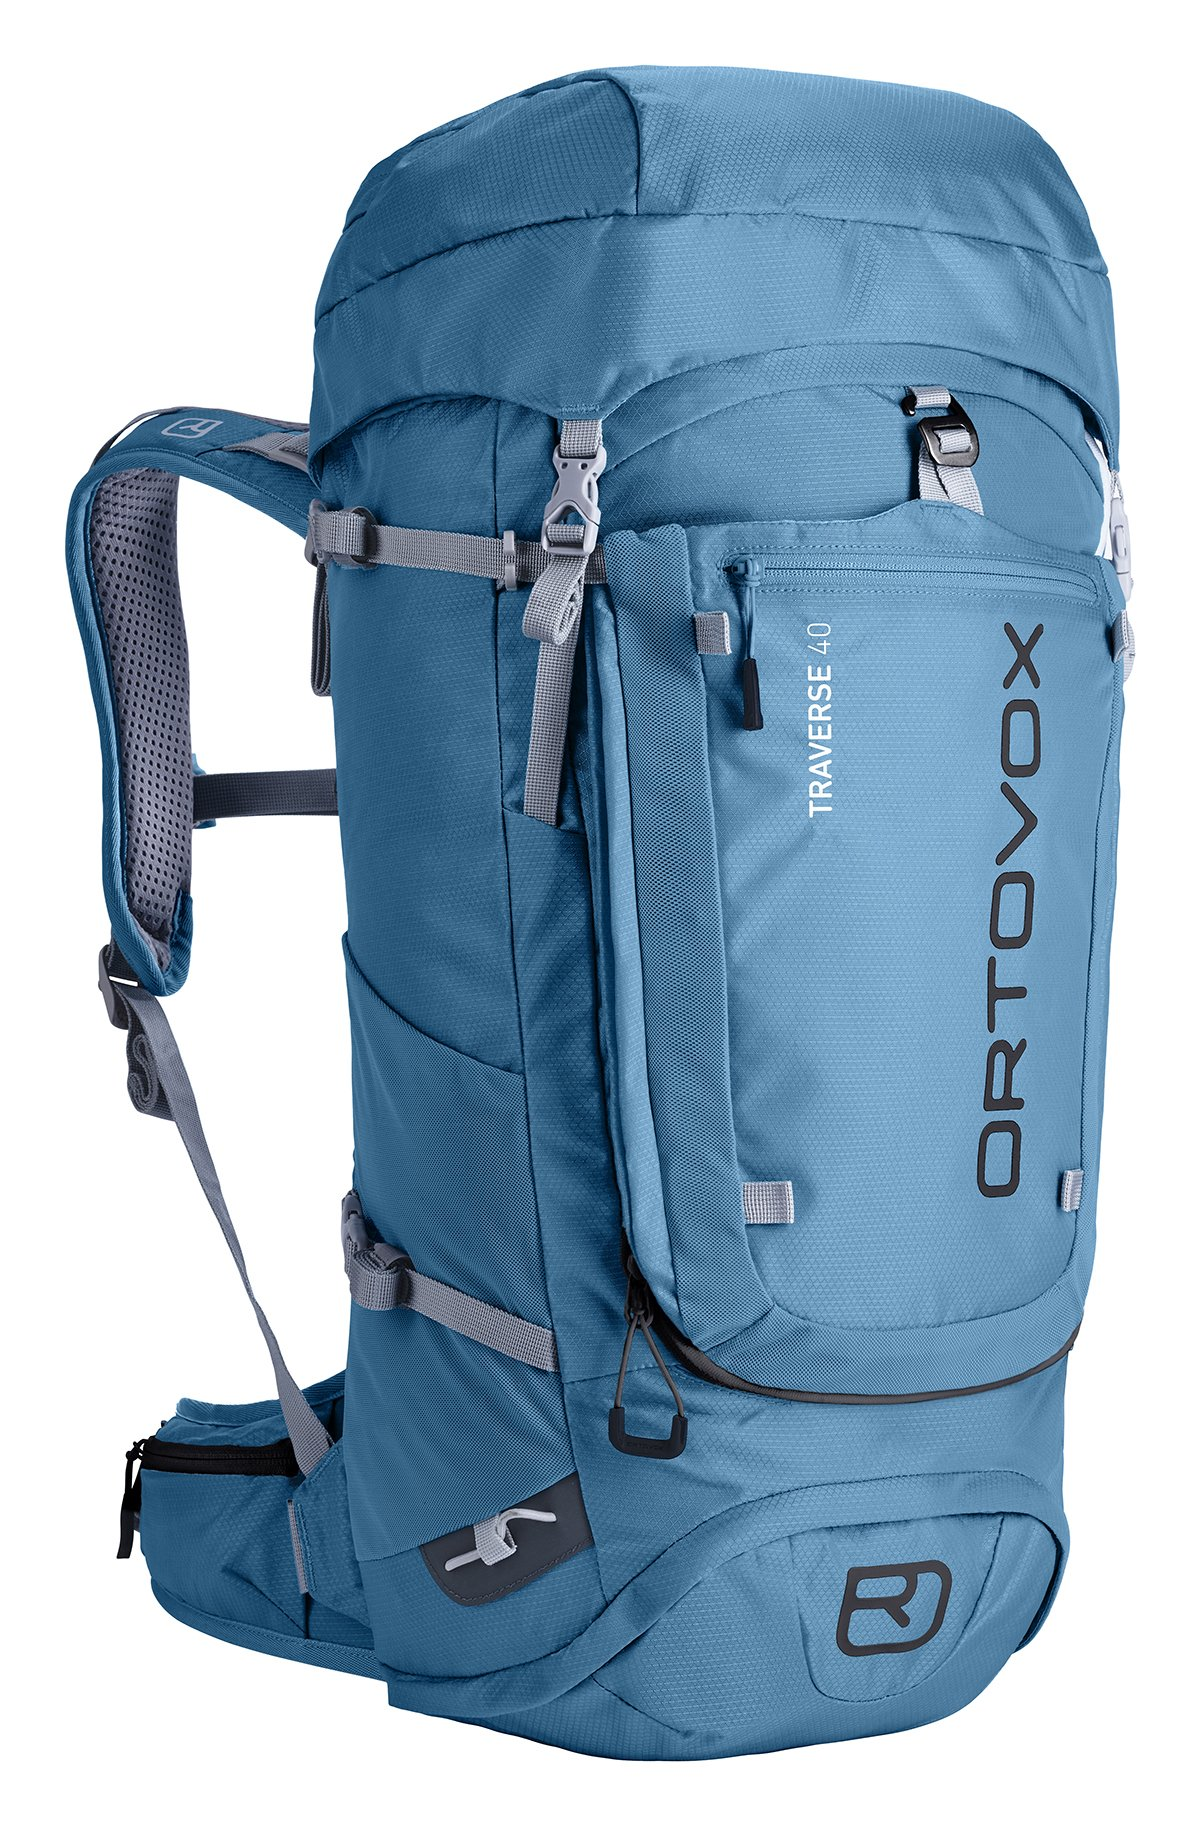 Ortovox Traverse 40 - Hiking backpack